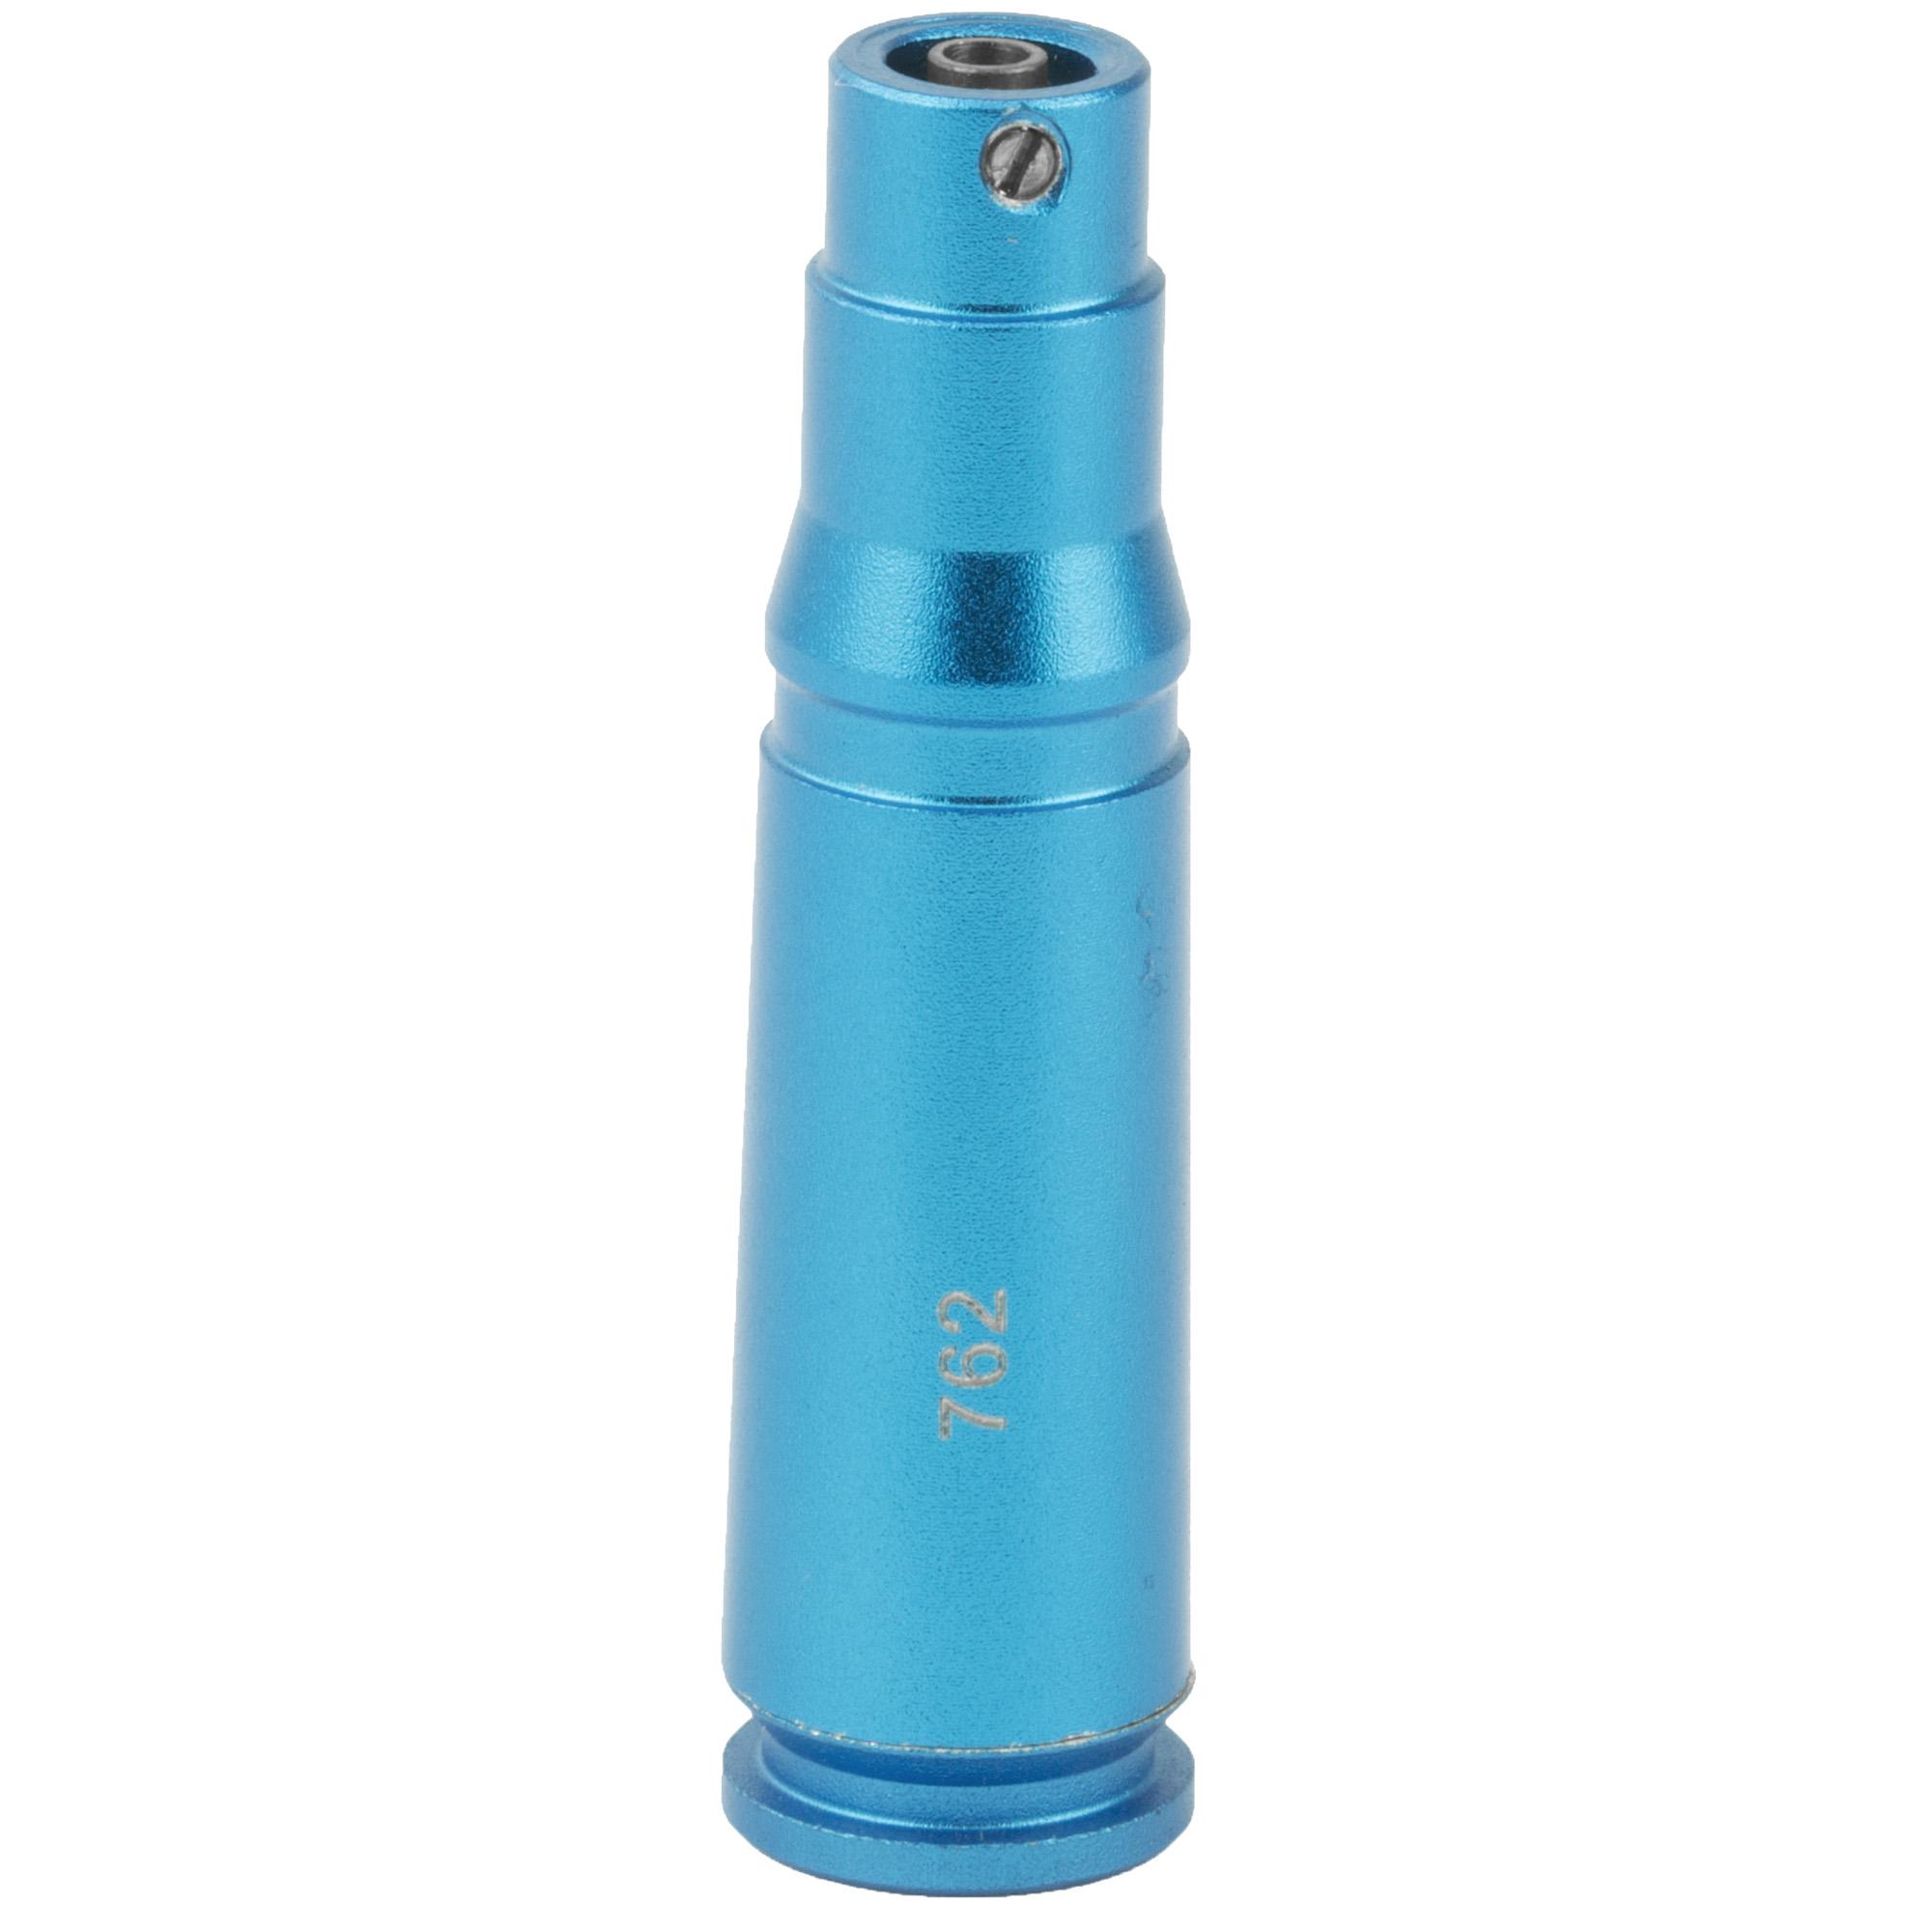 NCSTAR 7.62X39 7.62X39 Laser Cartridge Bore Sighter Boresighter – Blue